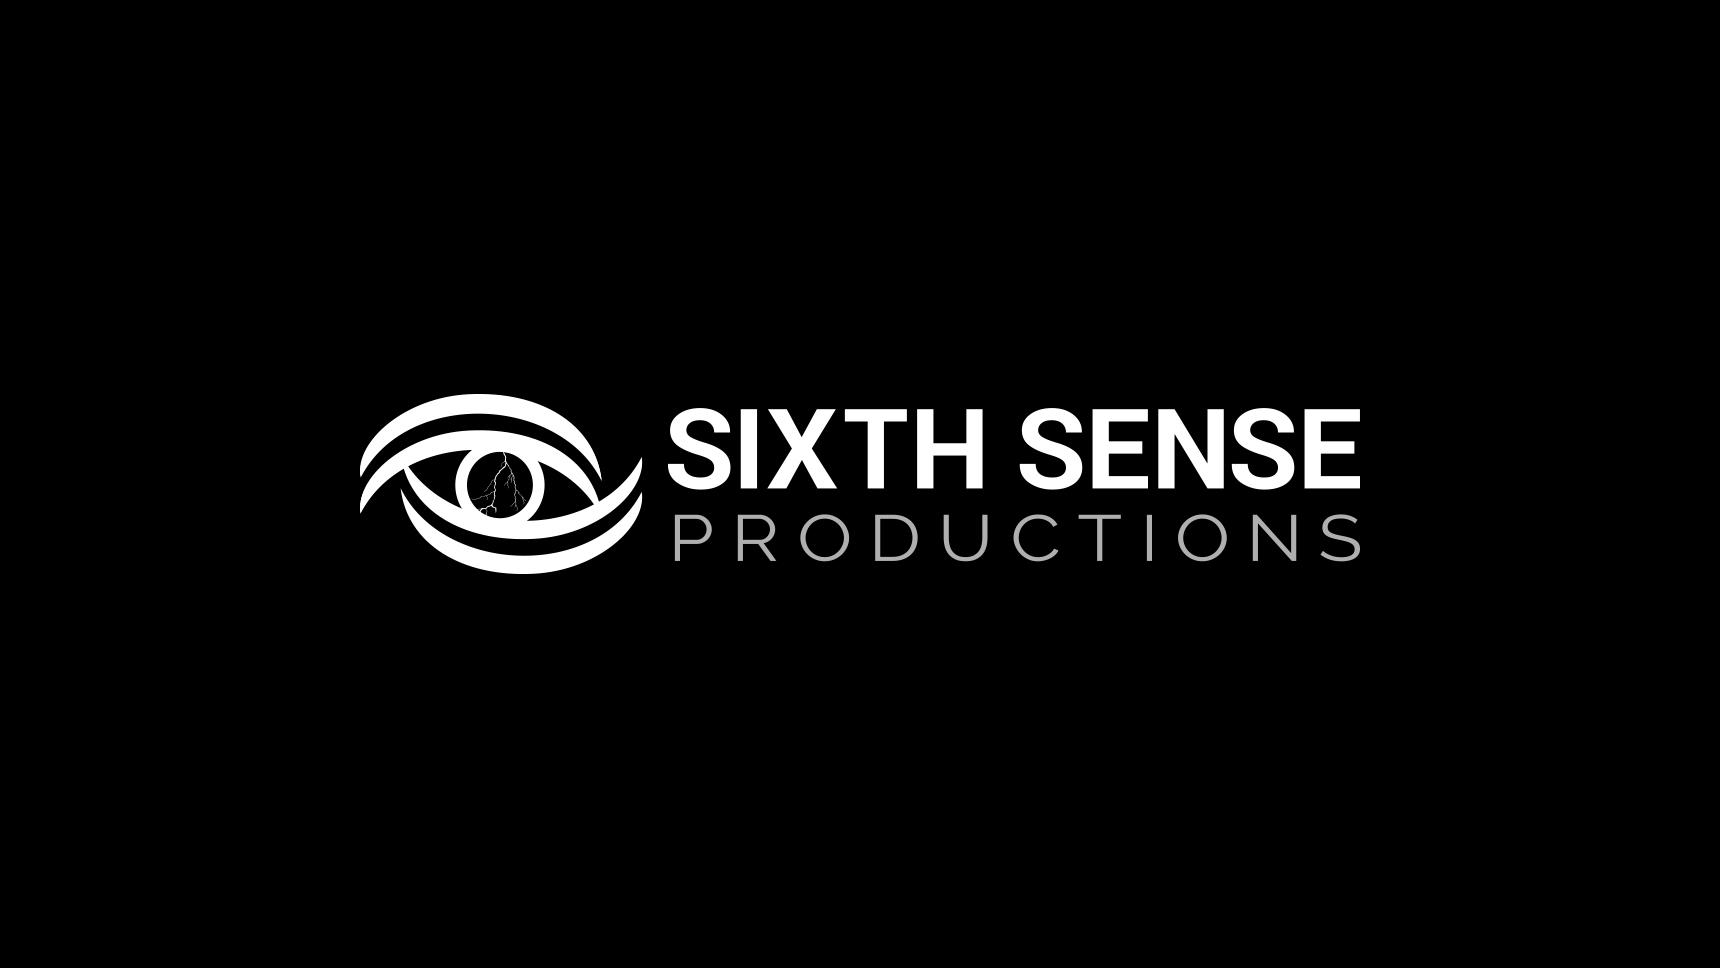 Sixth Sense Productions